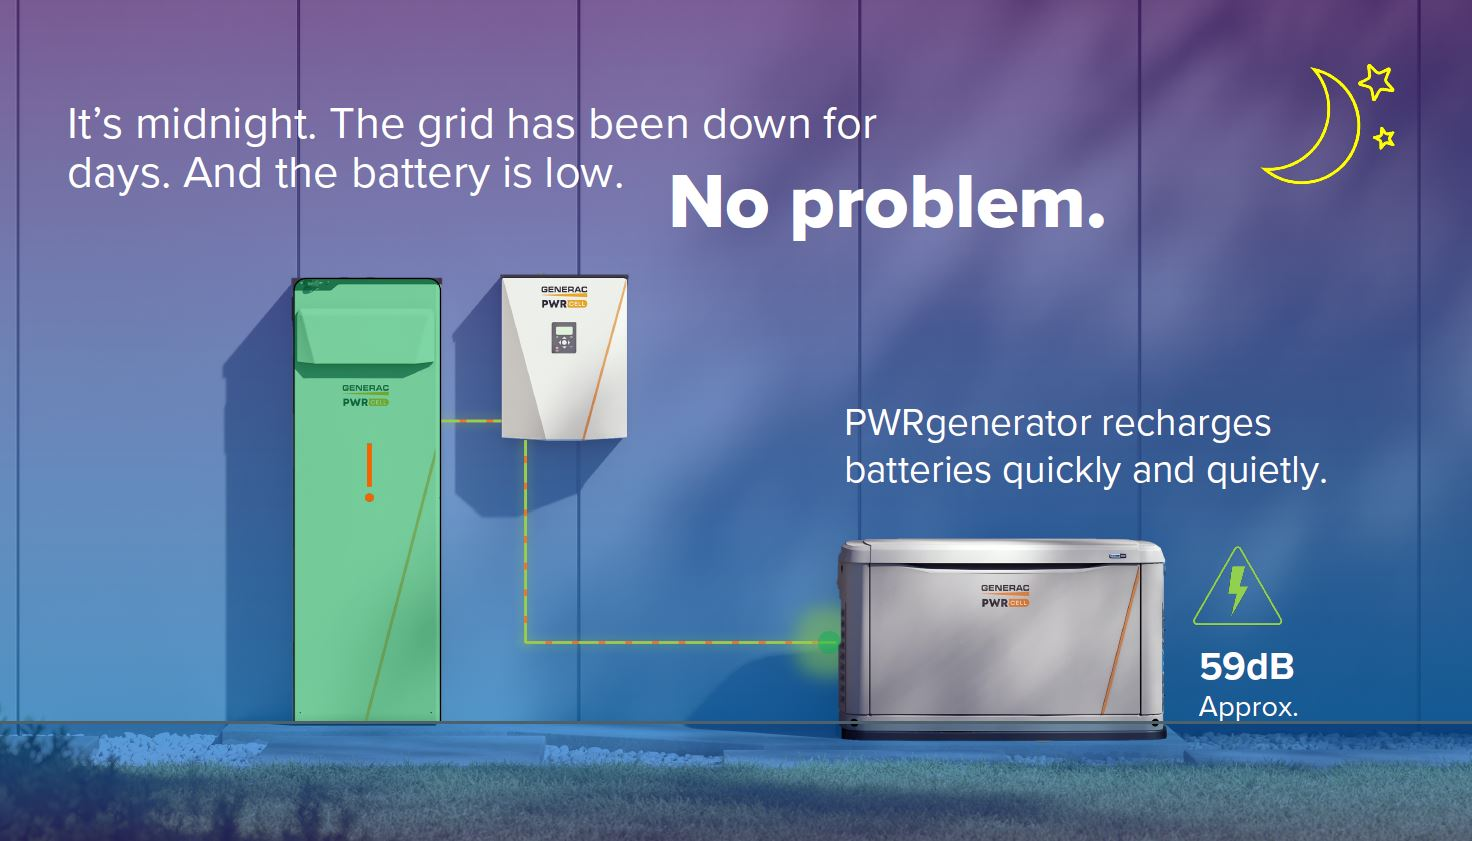 Generac generator at night